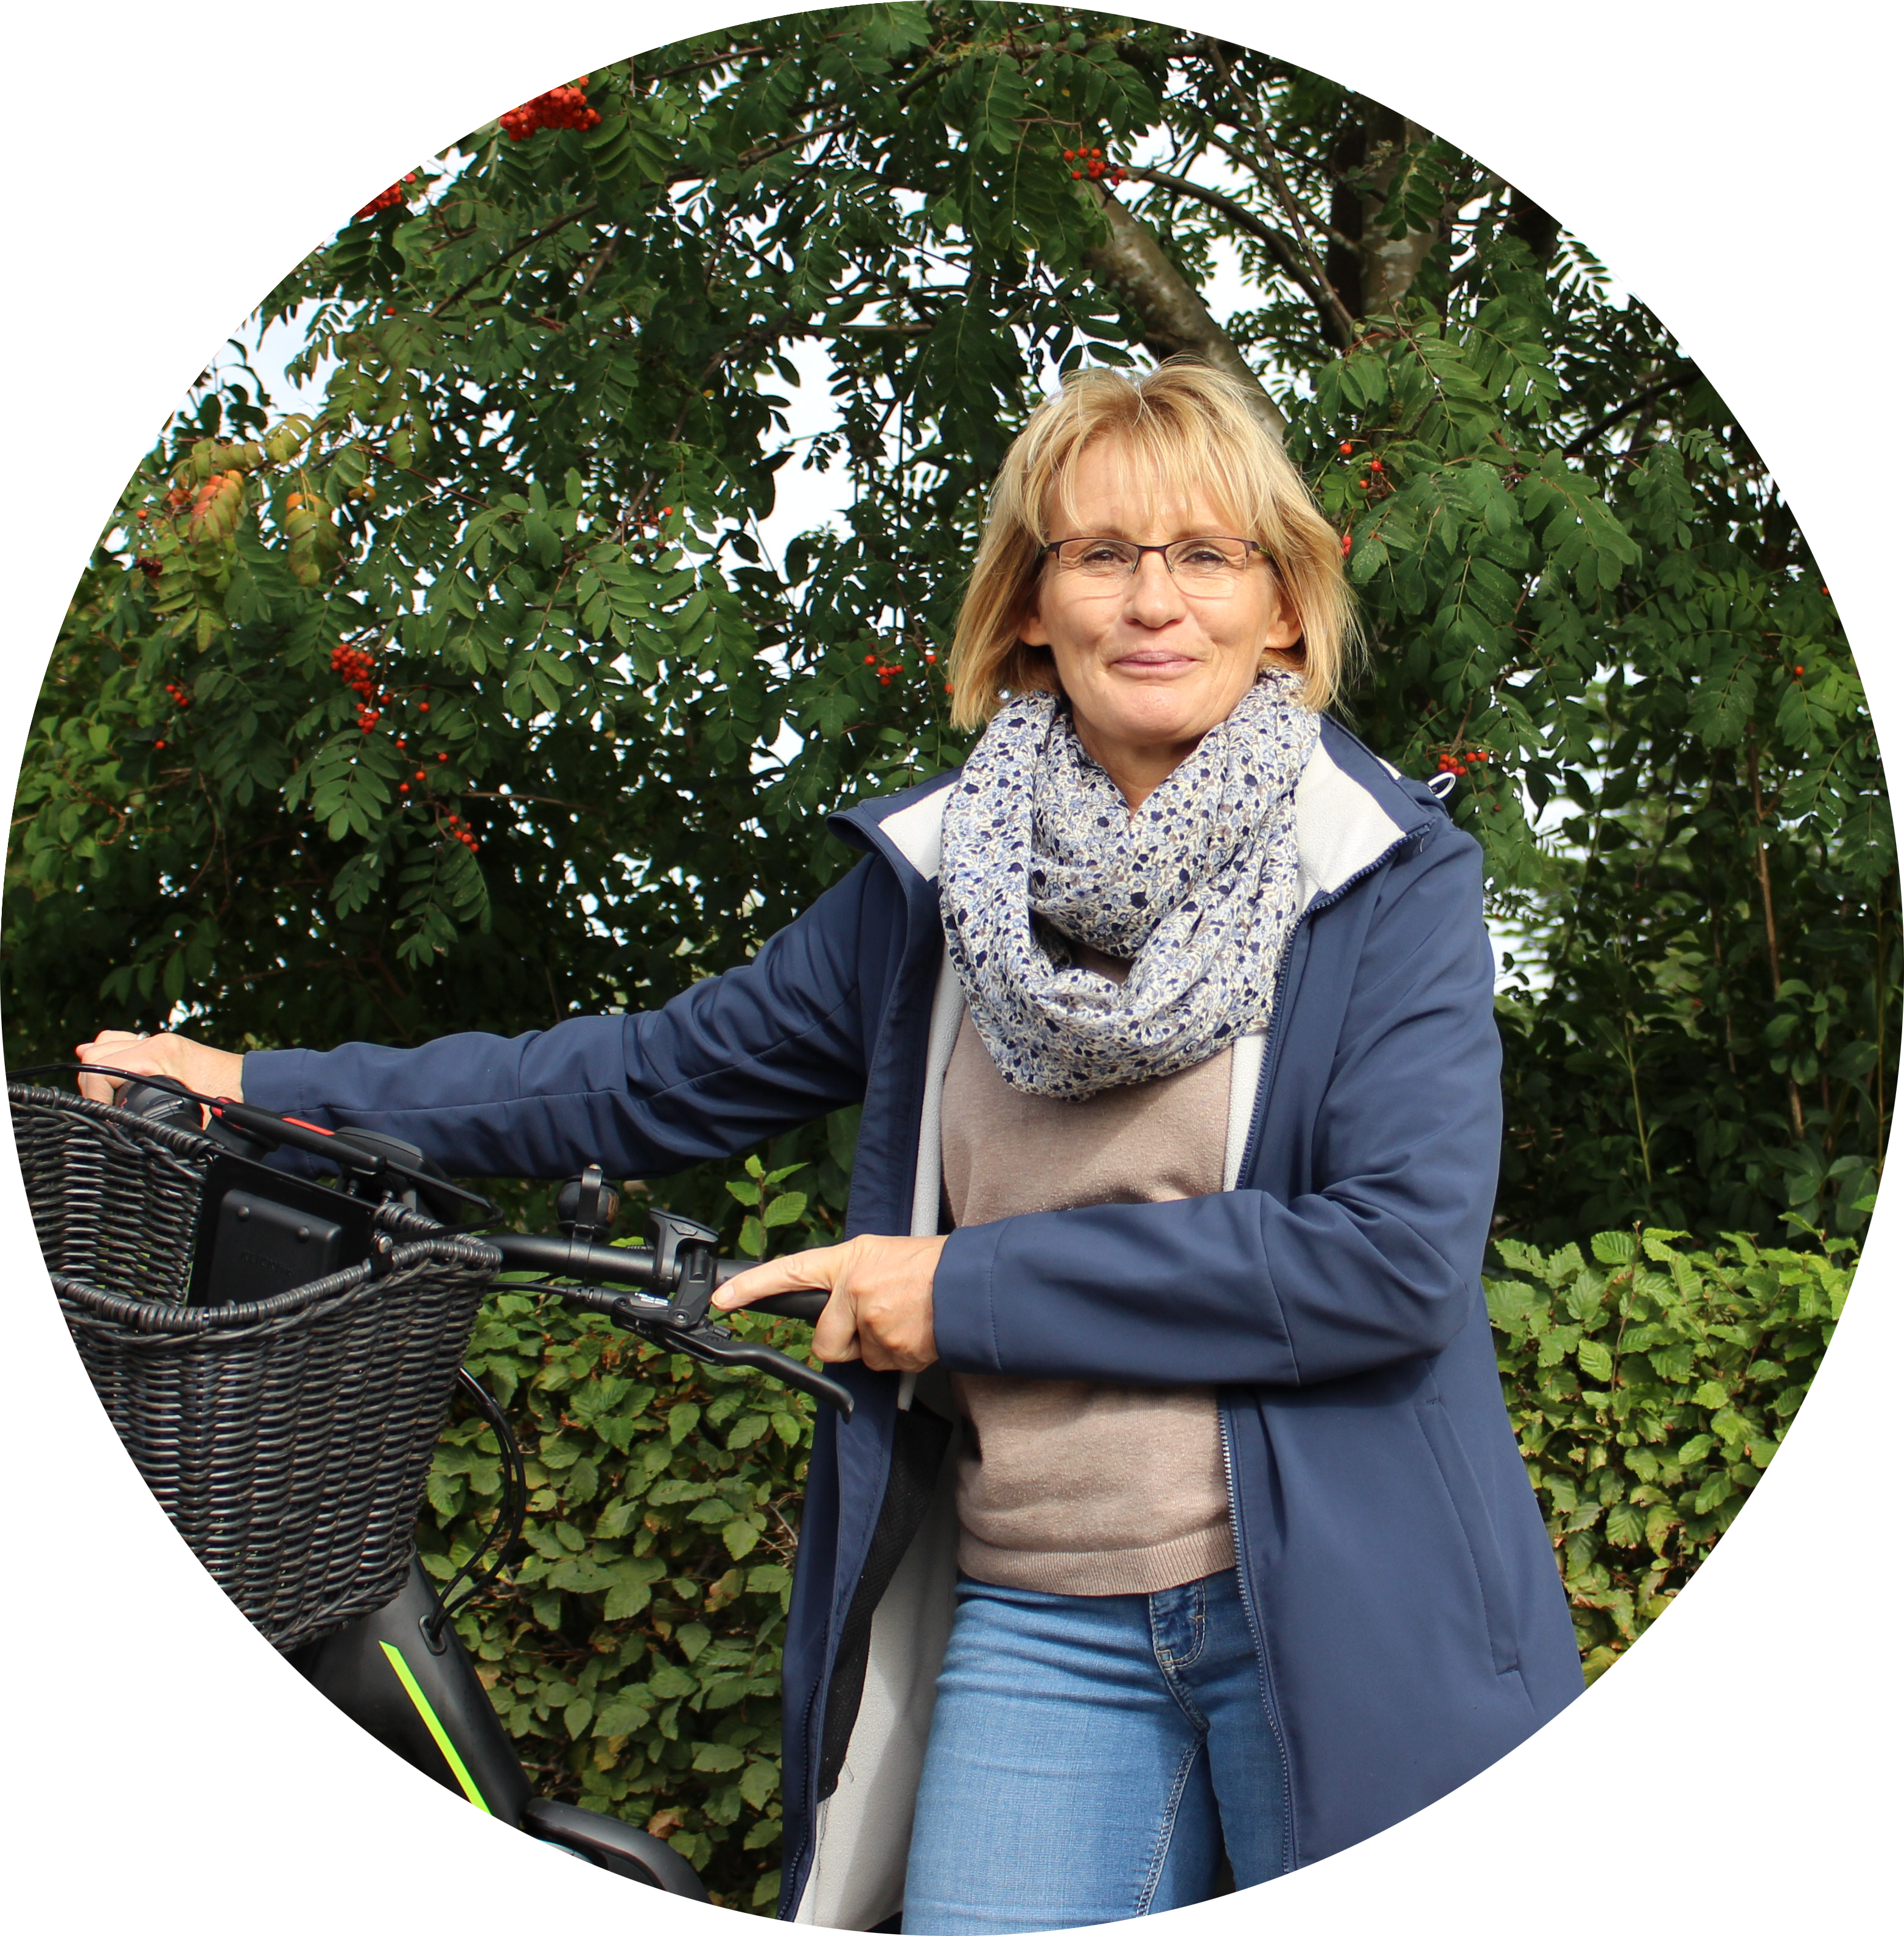 Radtouren-Guide Ute Lange (c) GDM, Kratz